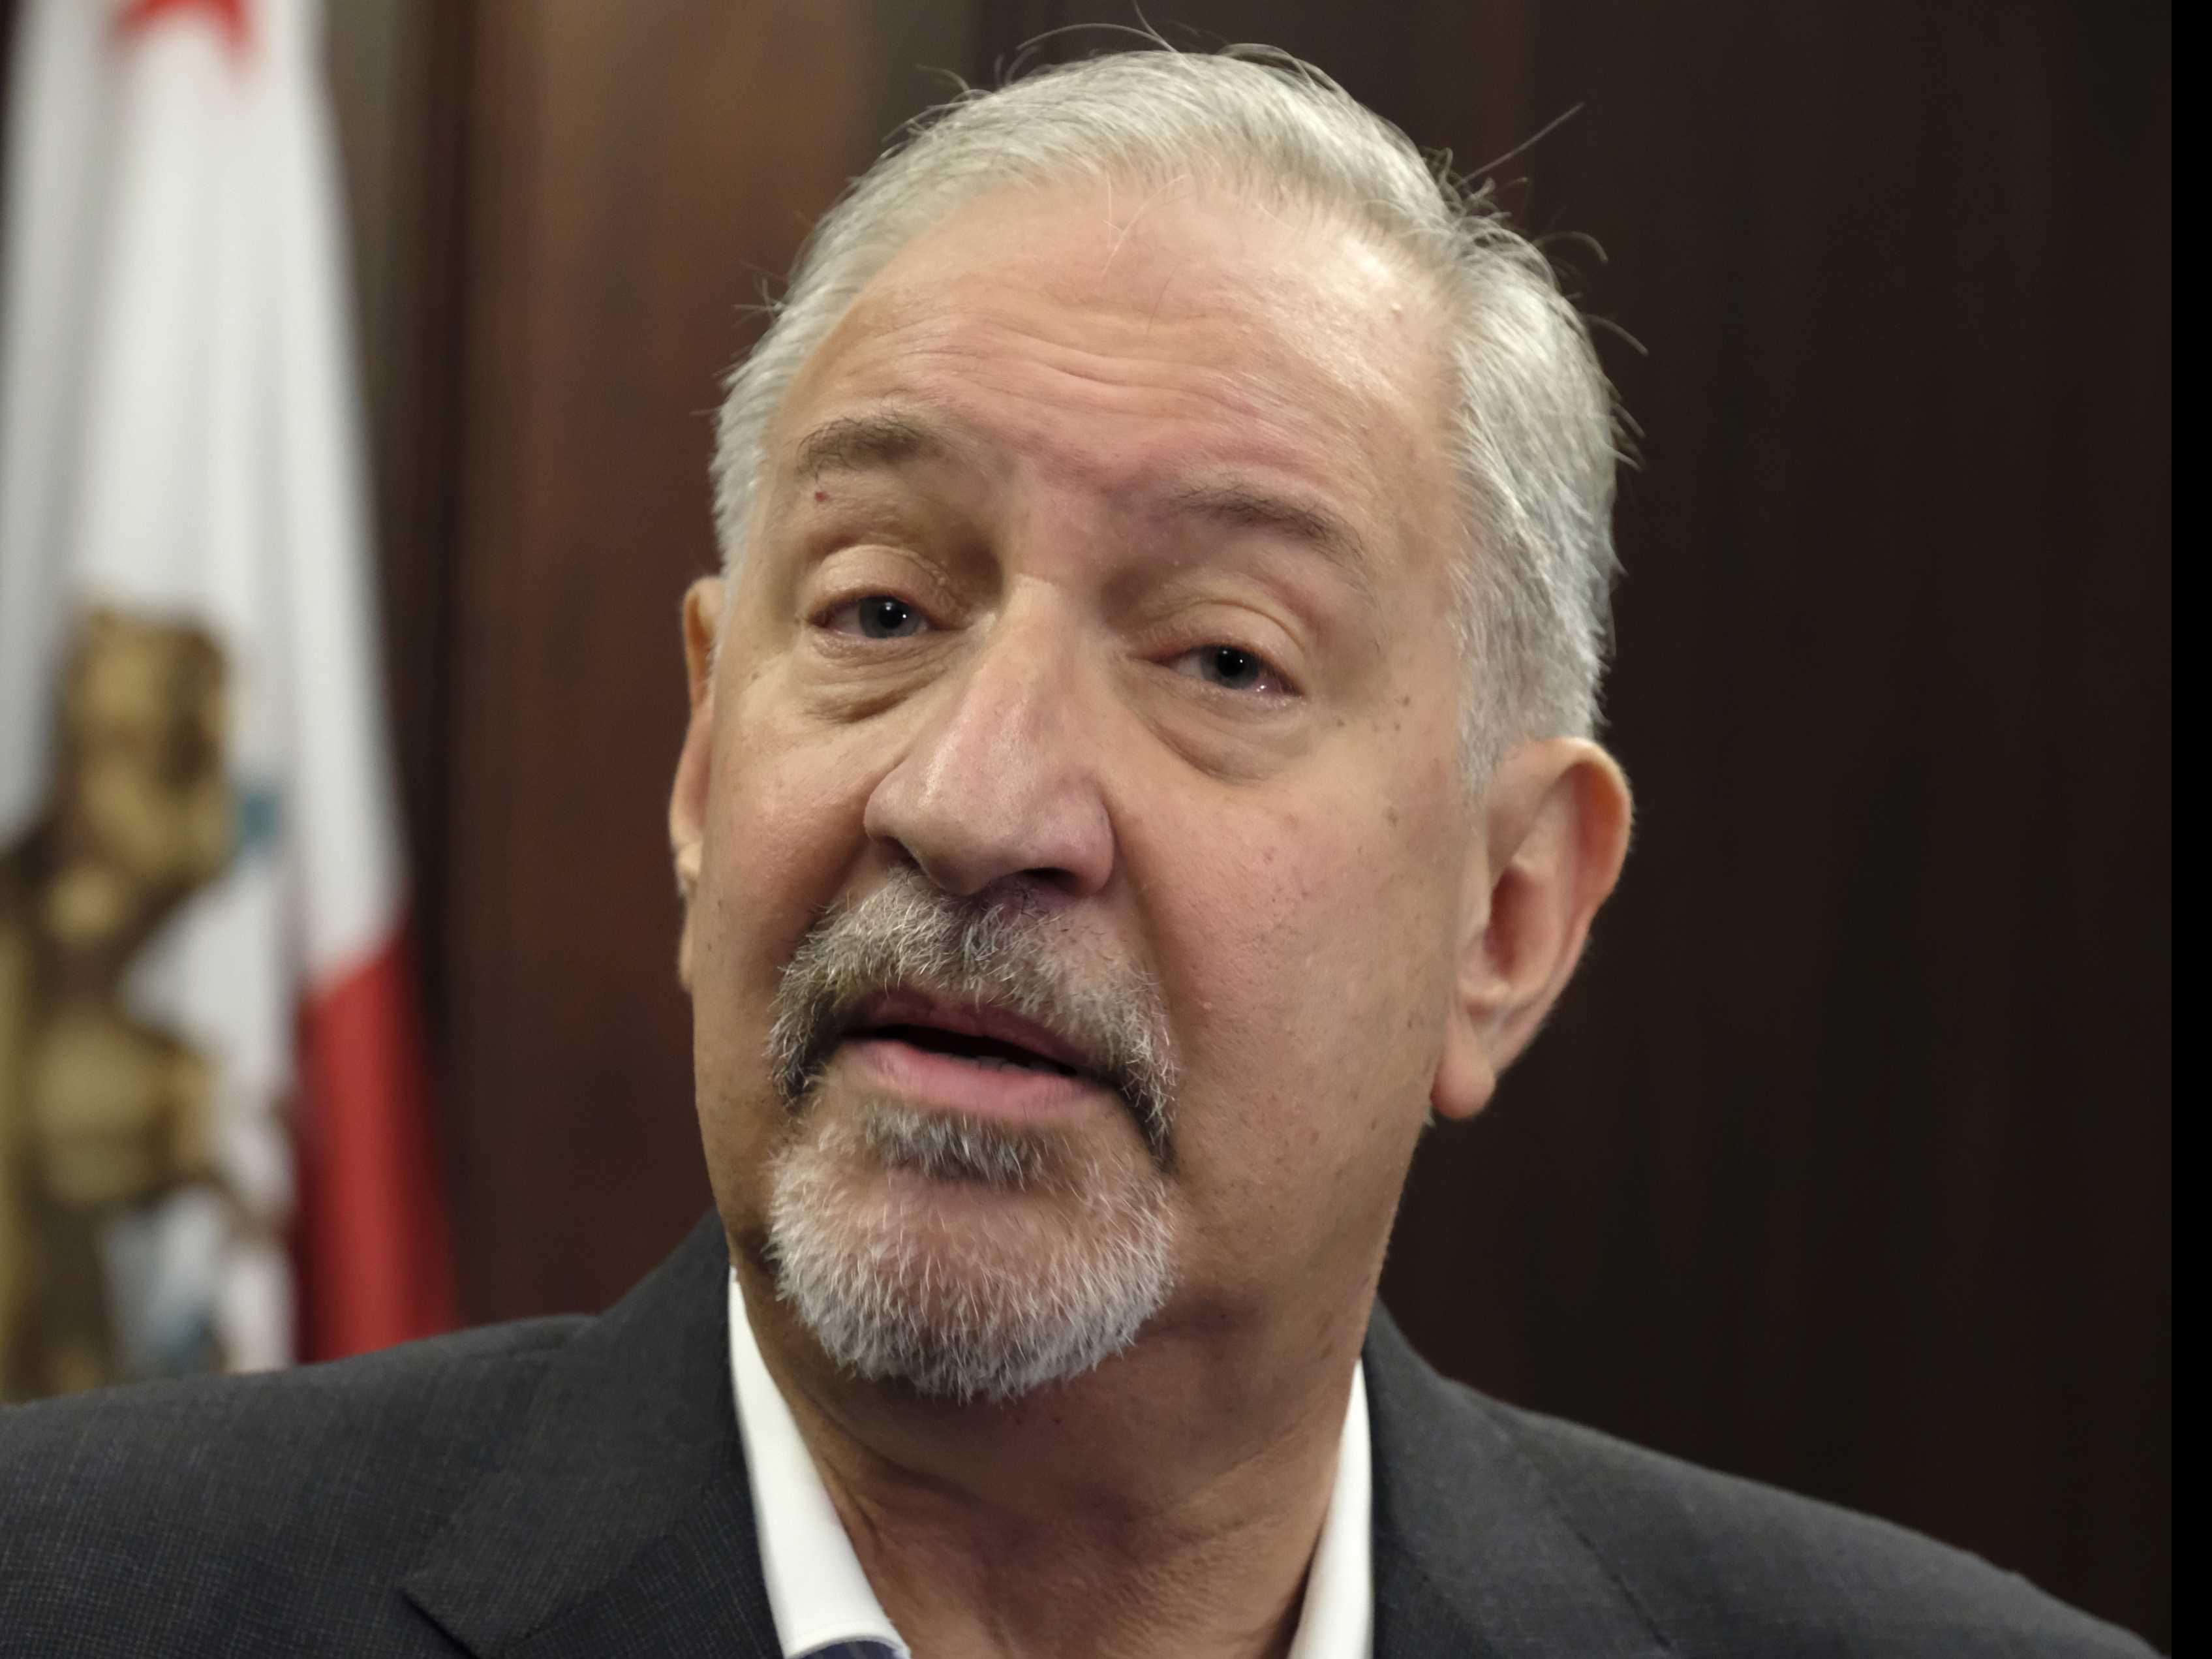 Celebrity Lawyer Geragos Named in Avenatti Extortion Case